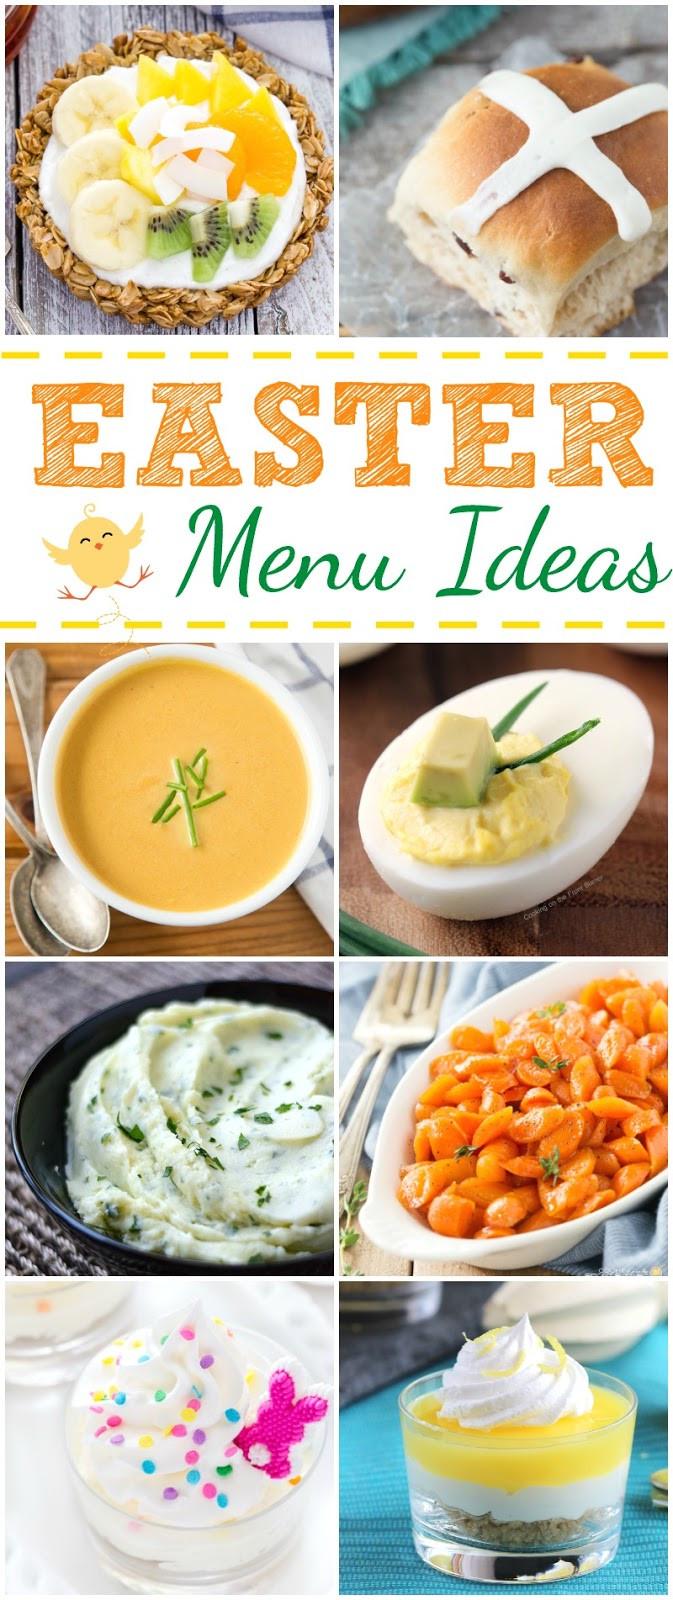 Easter Dinner Menu Ideas  Easter Menu Ideas